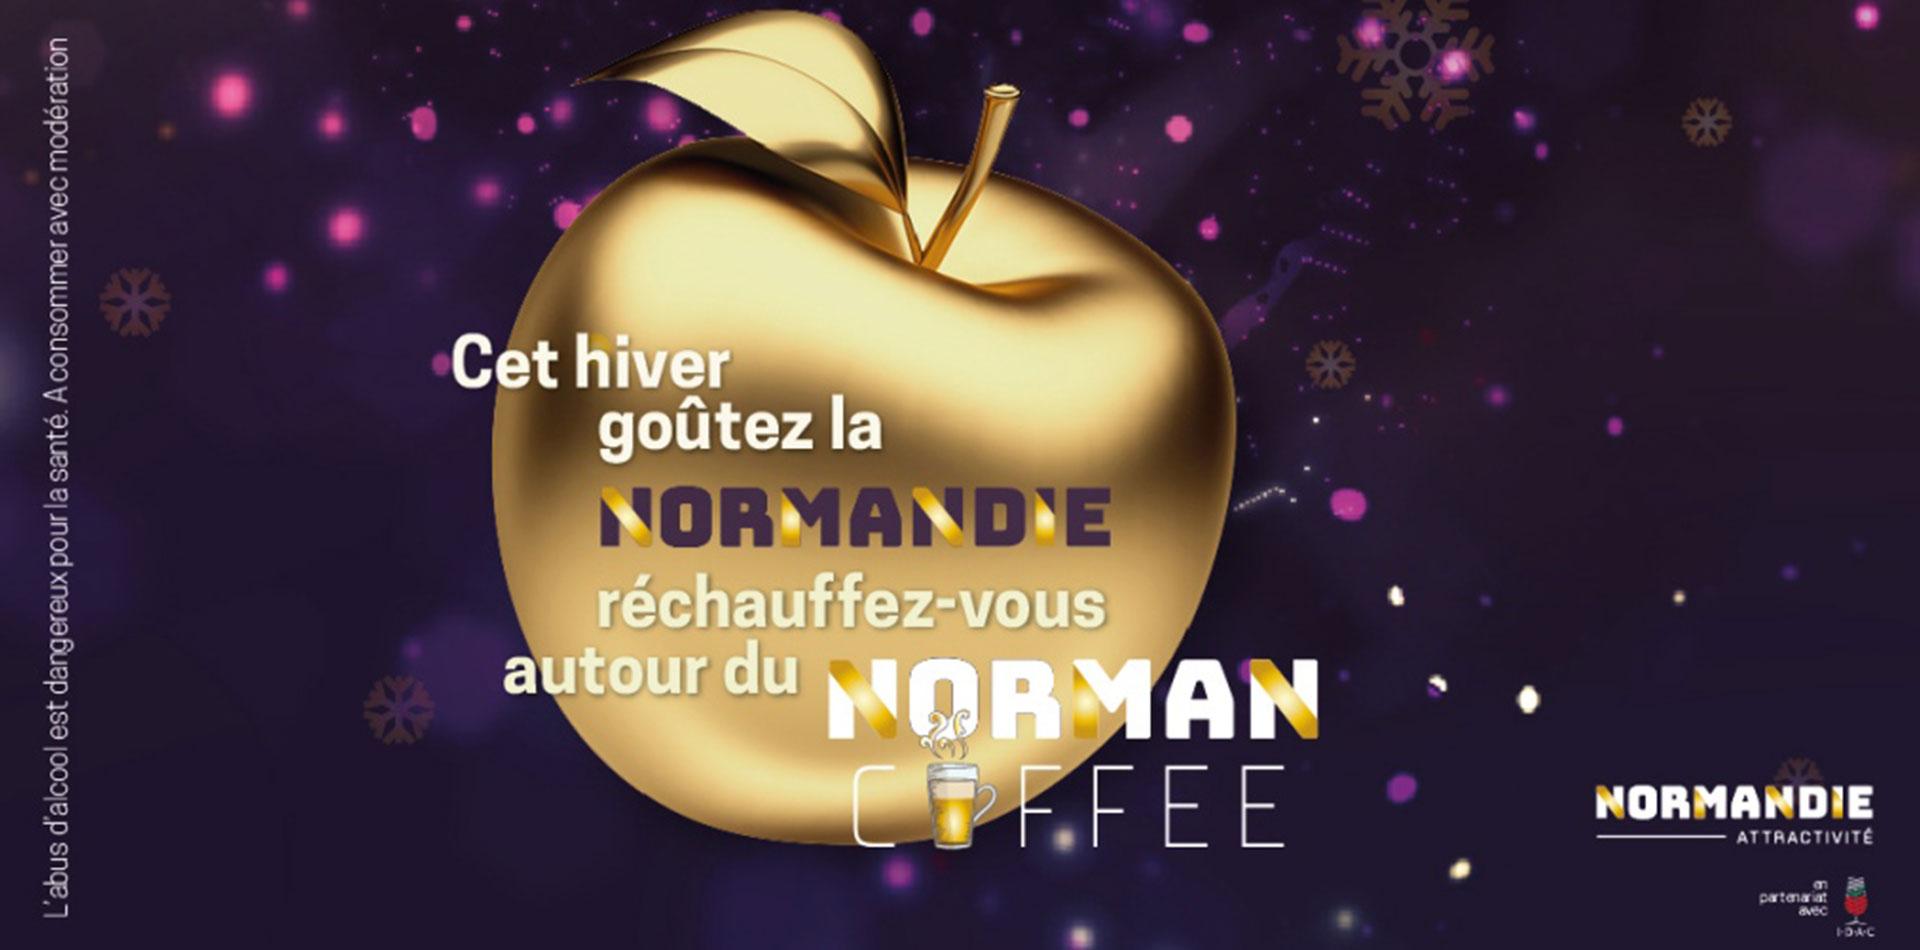 Norman Coffee